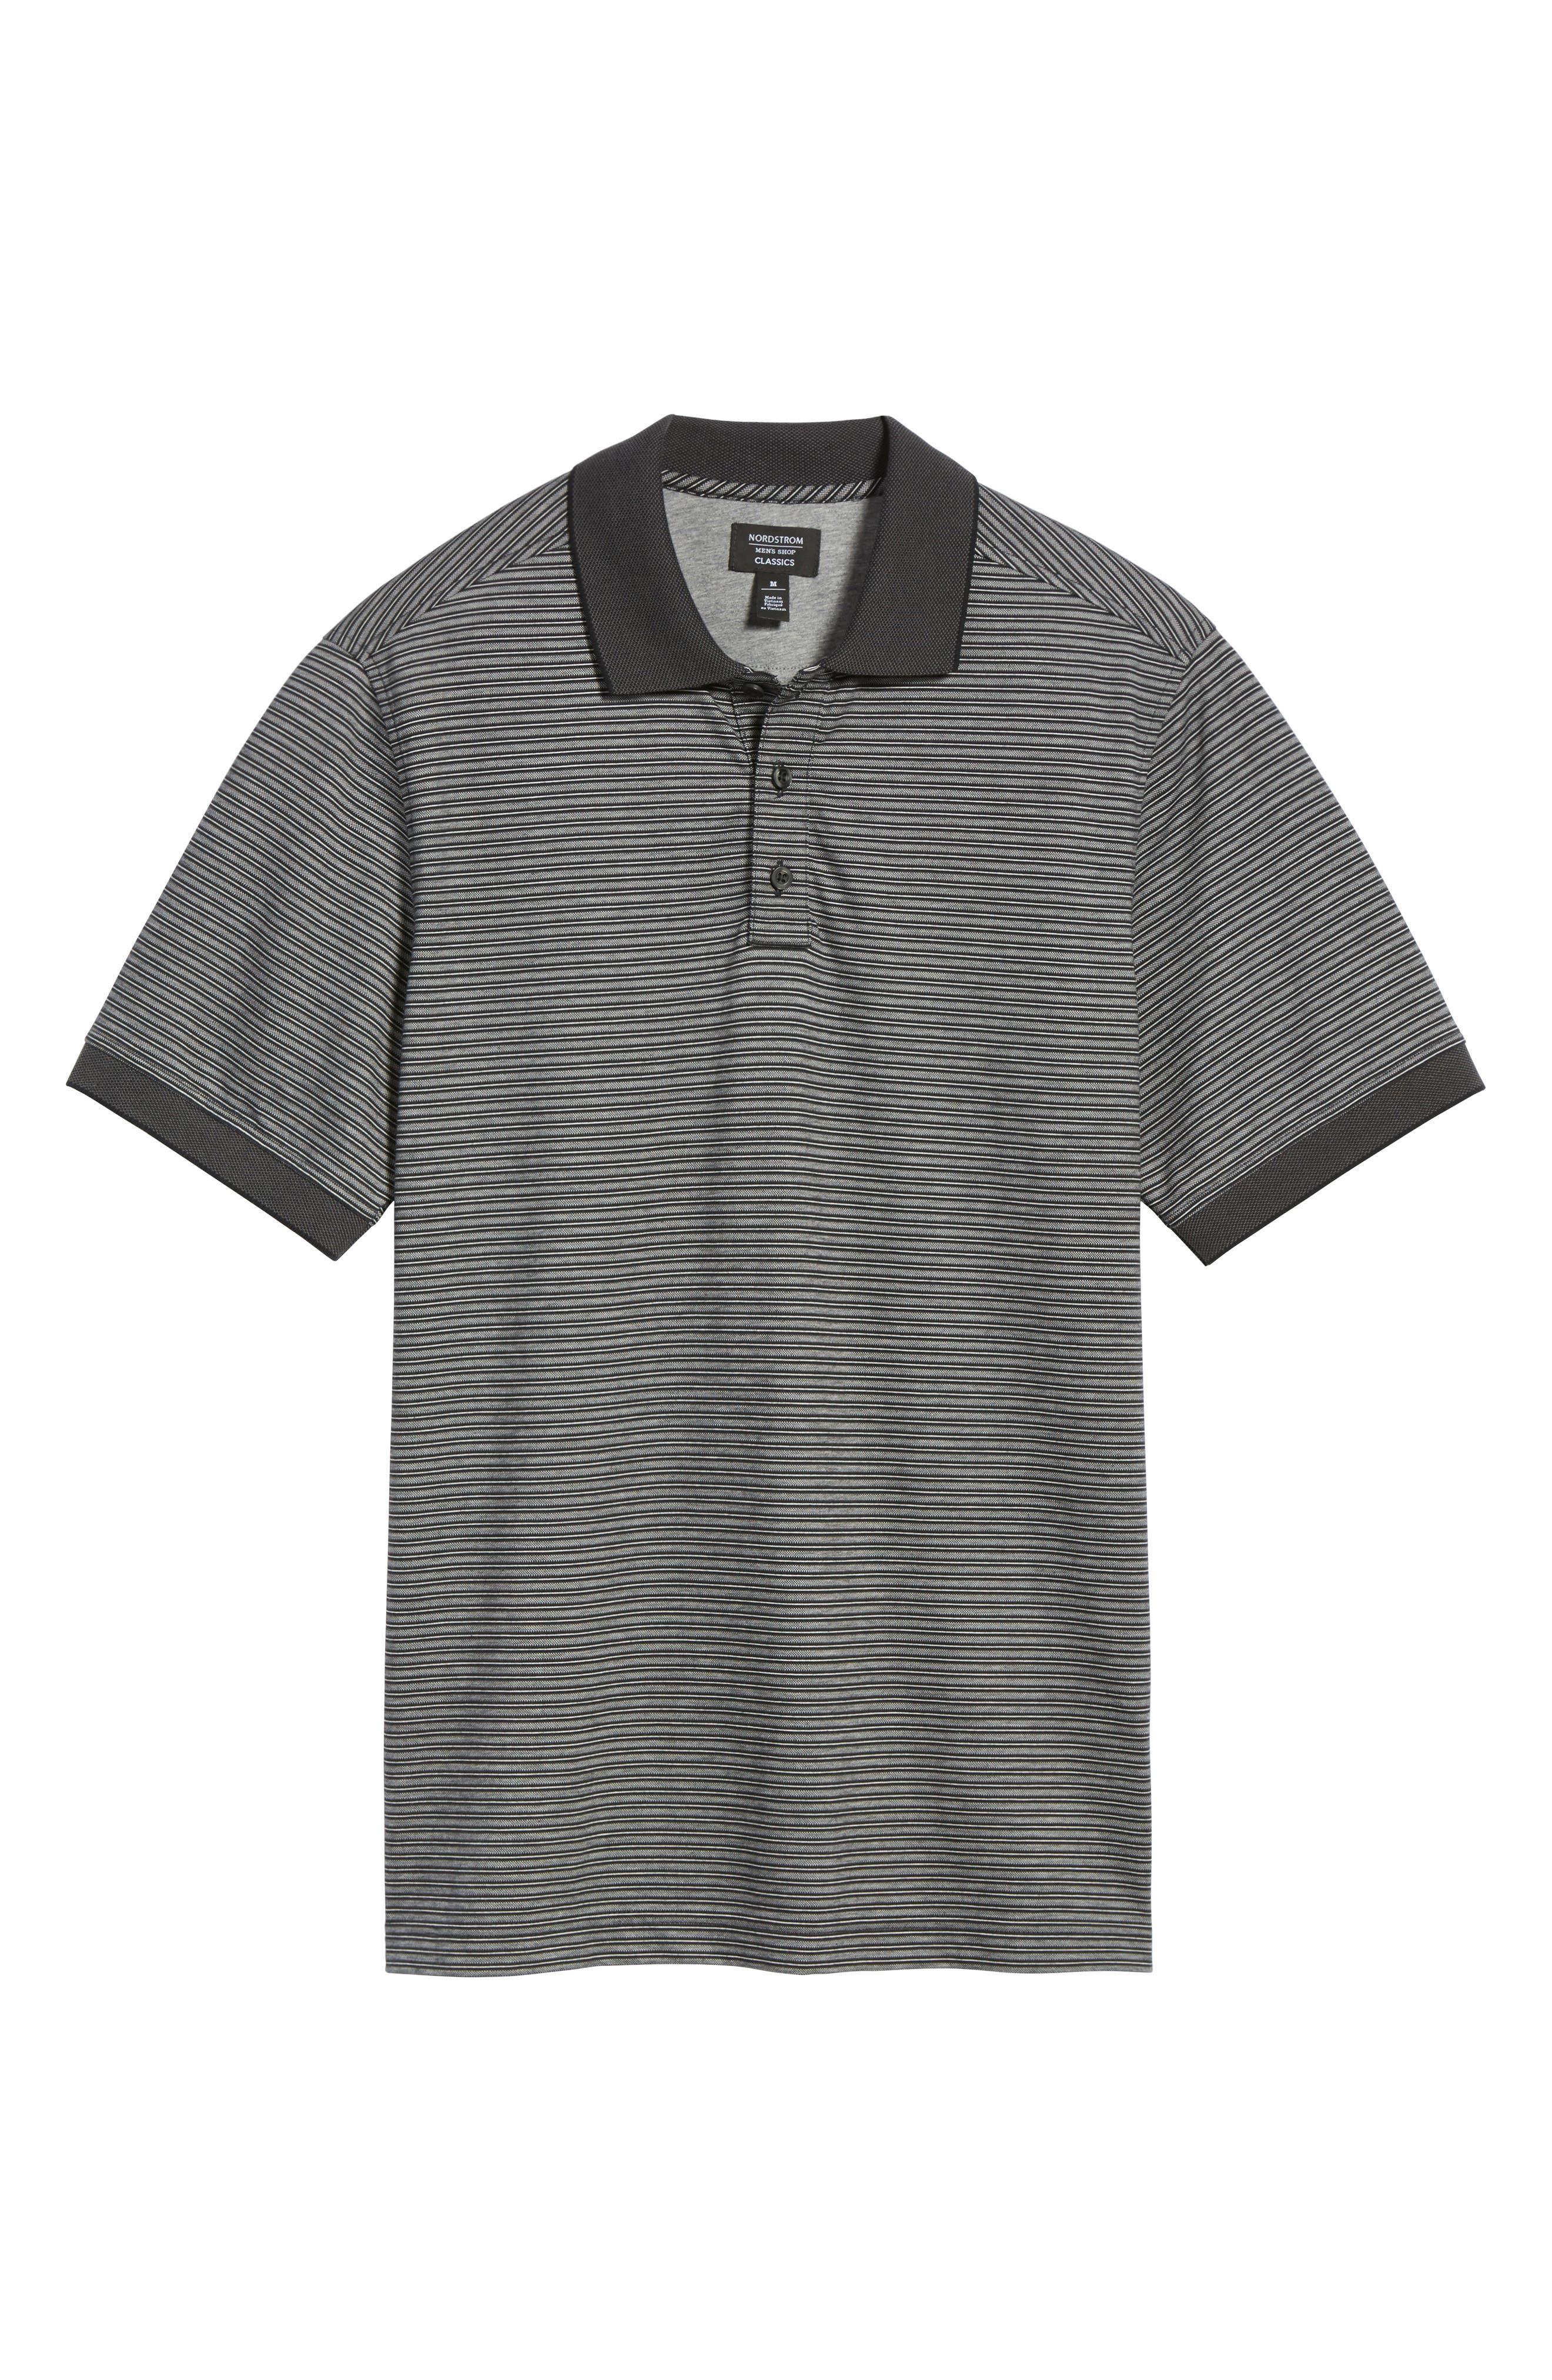 Regular Fit Performance Stripe Polo,                             Alternate thumbnail 6, color,                             030